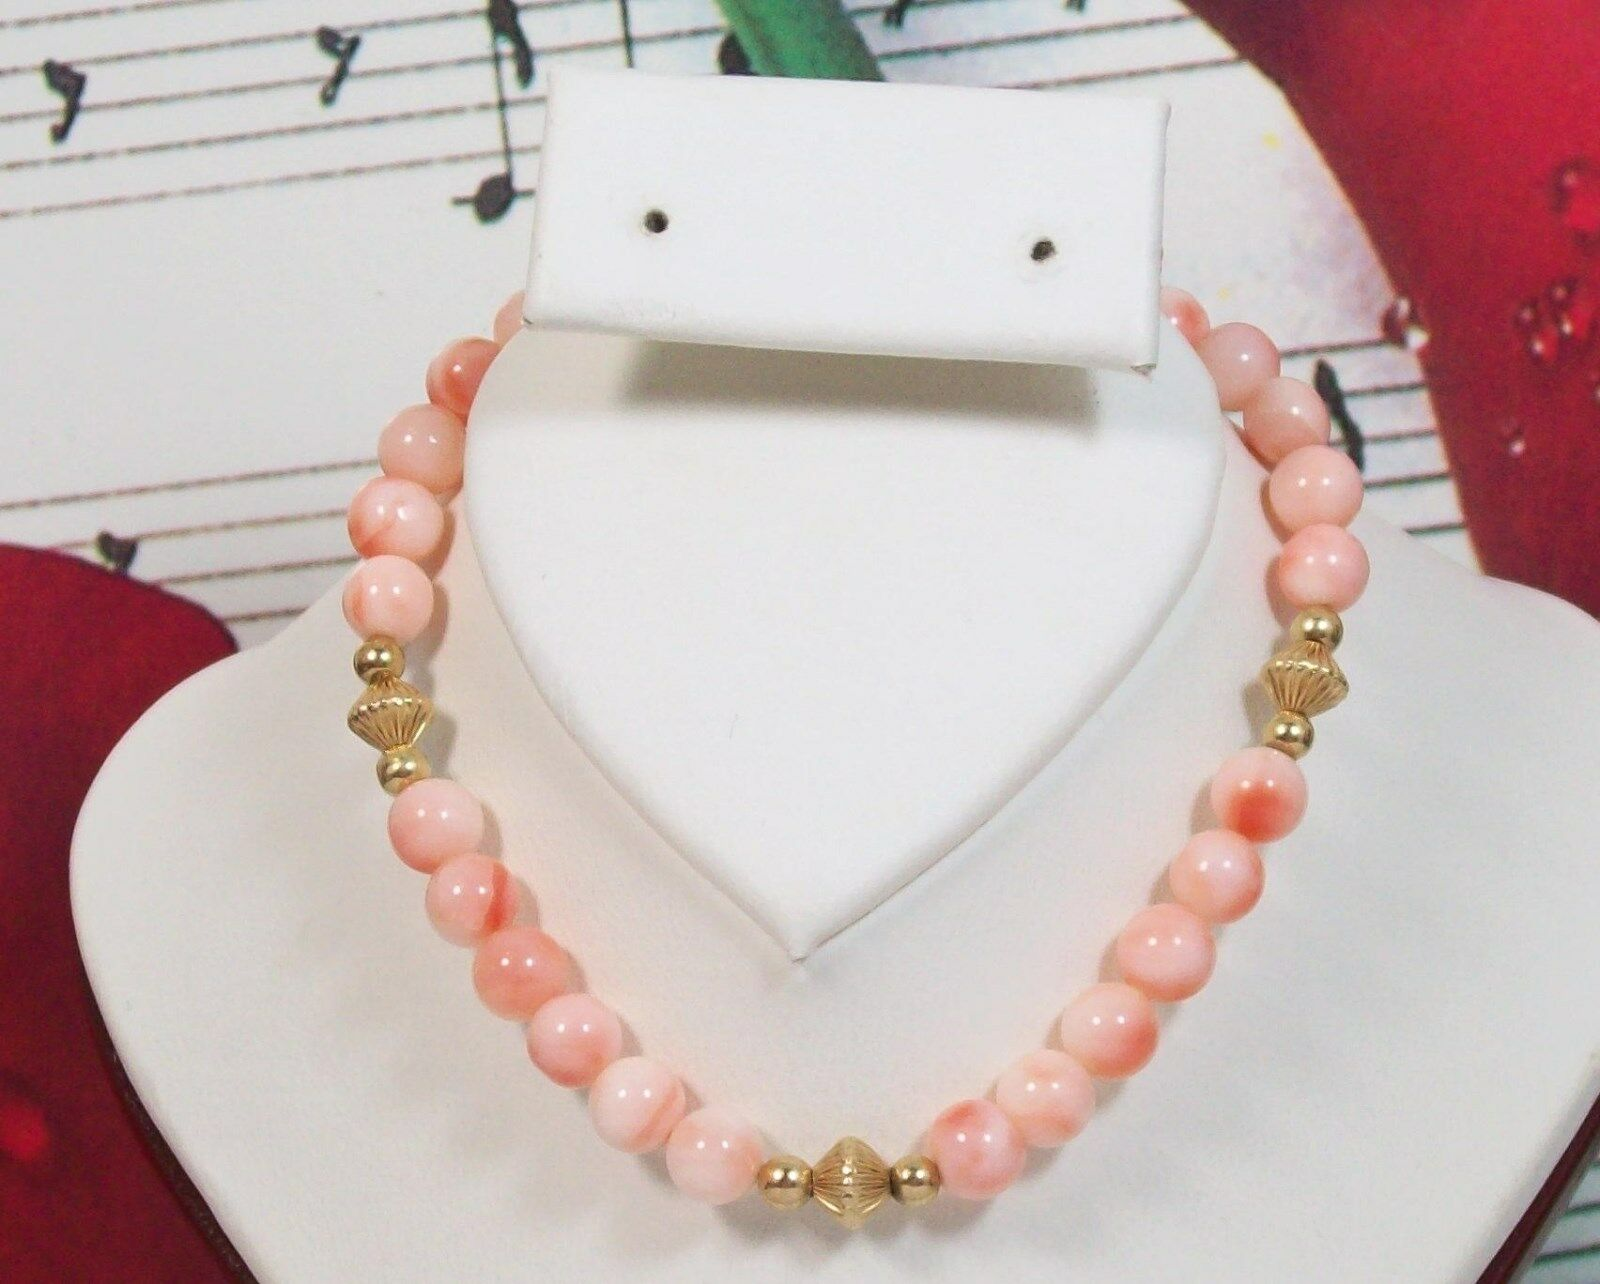 Genuine Coral Beaded Bracelet 6.5 - 7  with 14K gold Filled.100% Natural. CB0014